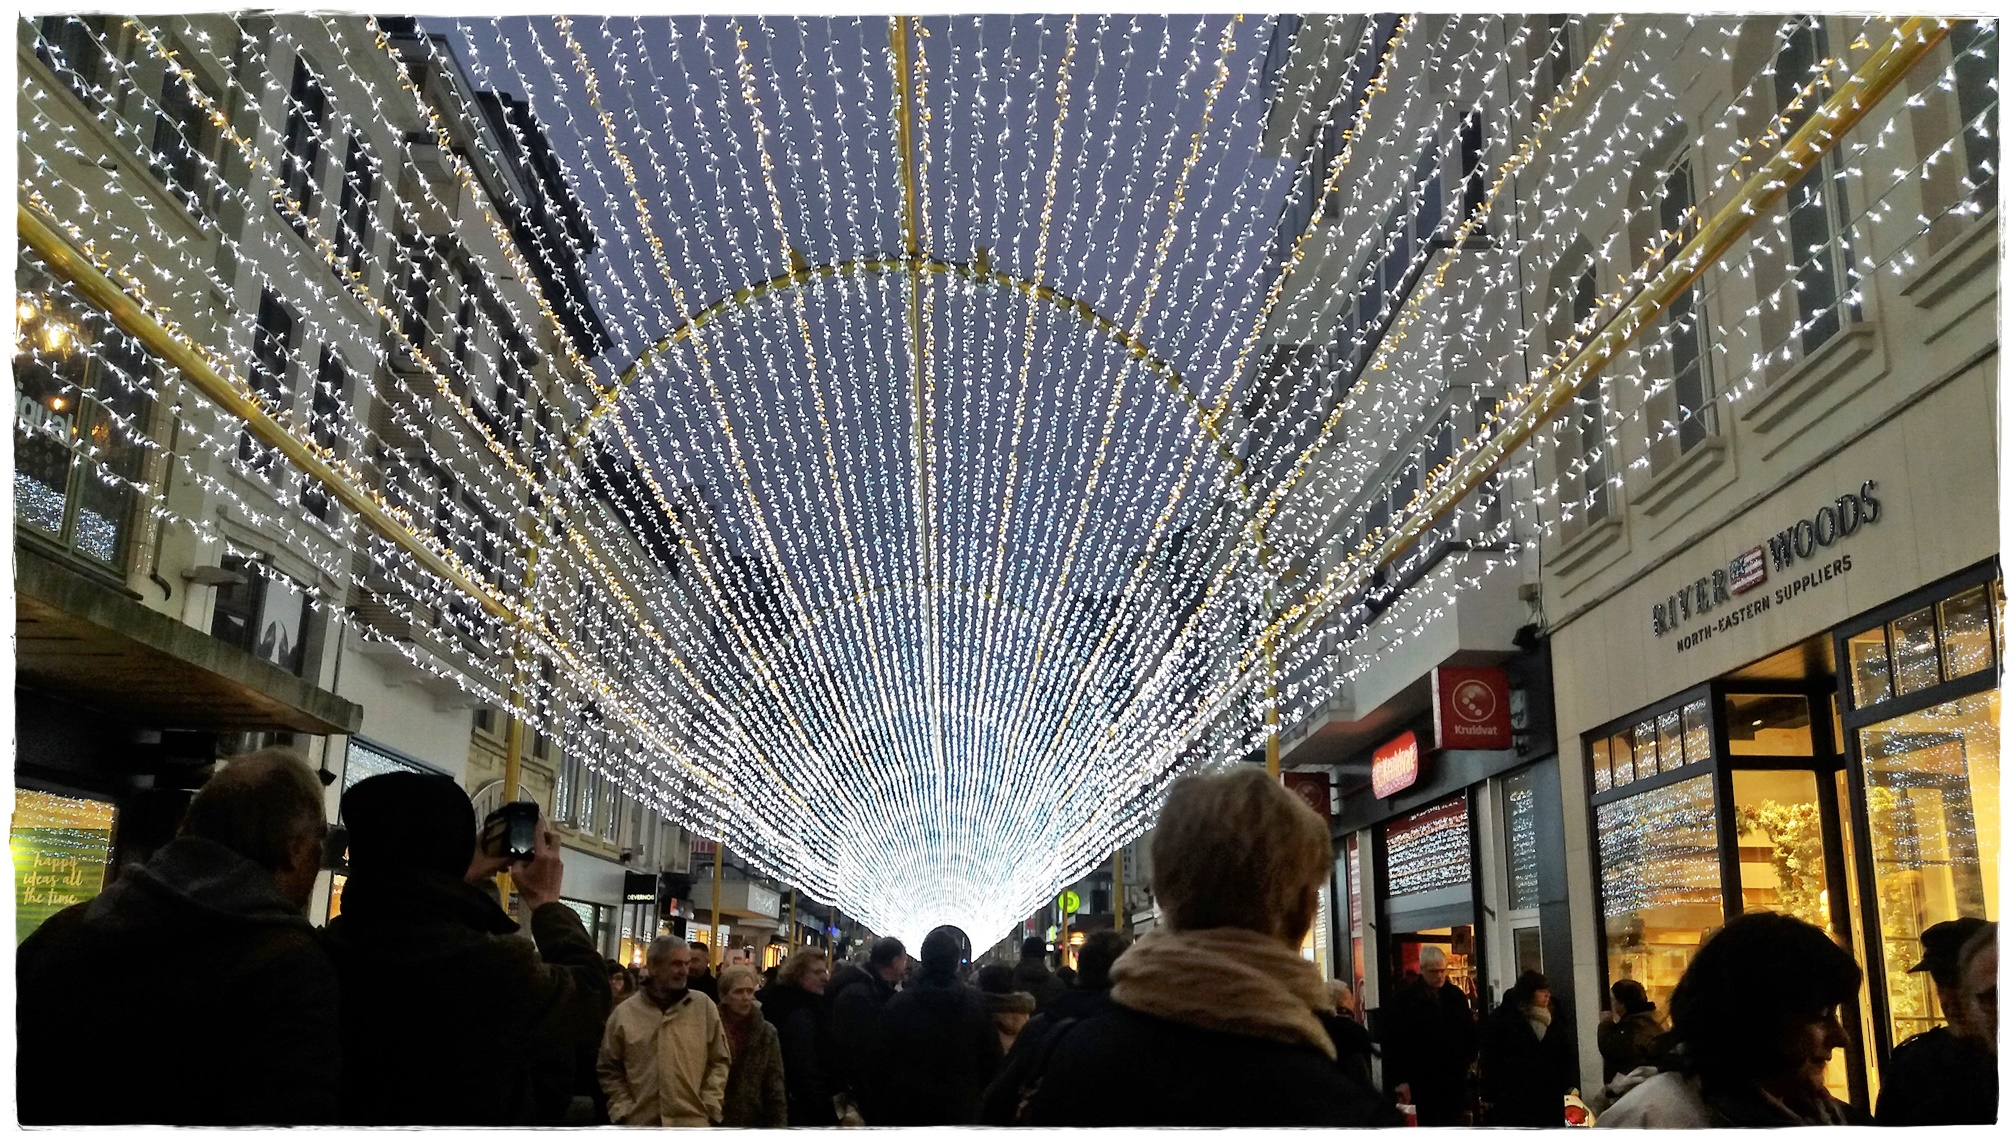 Afbeeldingsresultaat voor wapenplein kerstmis oostende